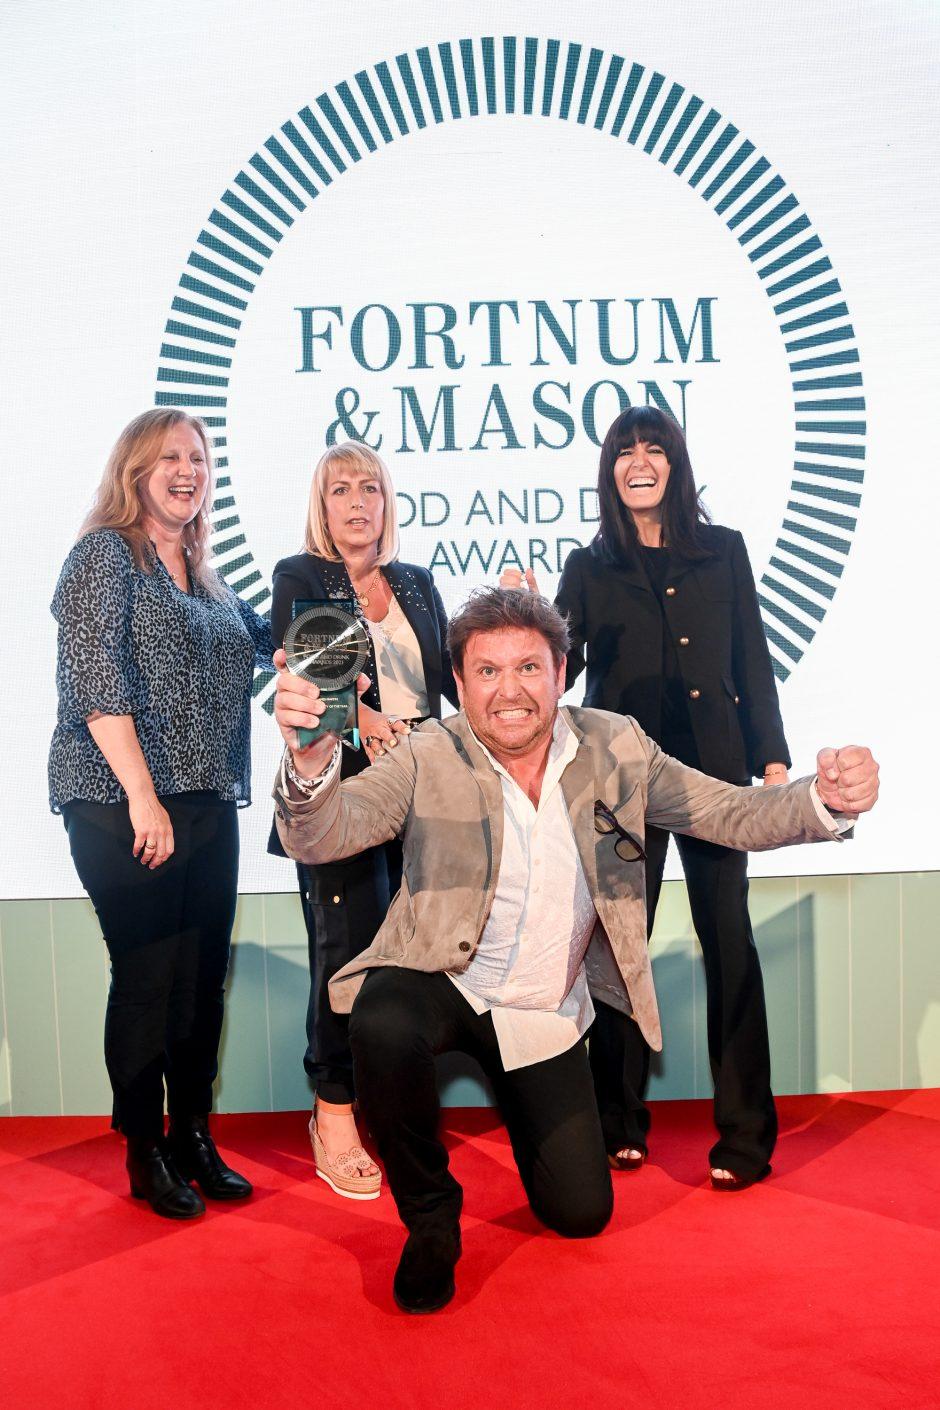 Fortnum & Mason Food and Drink Awards 2021